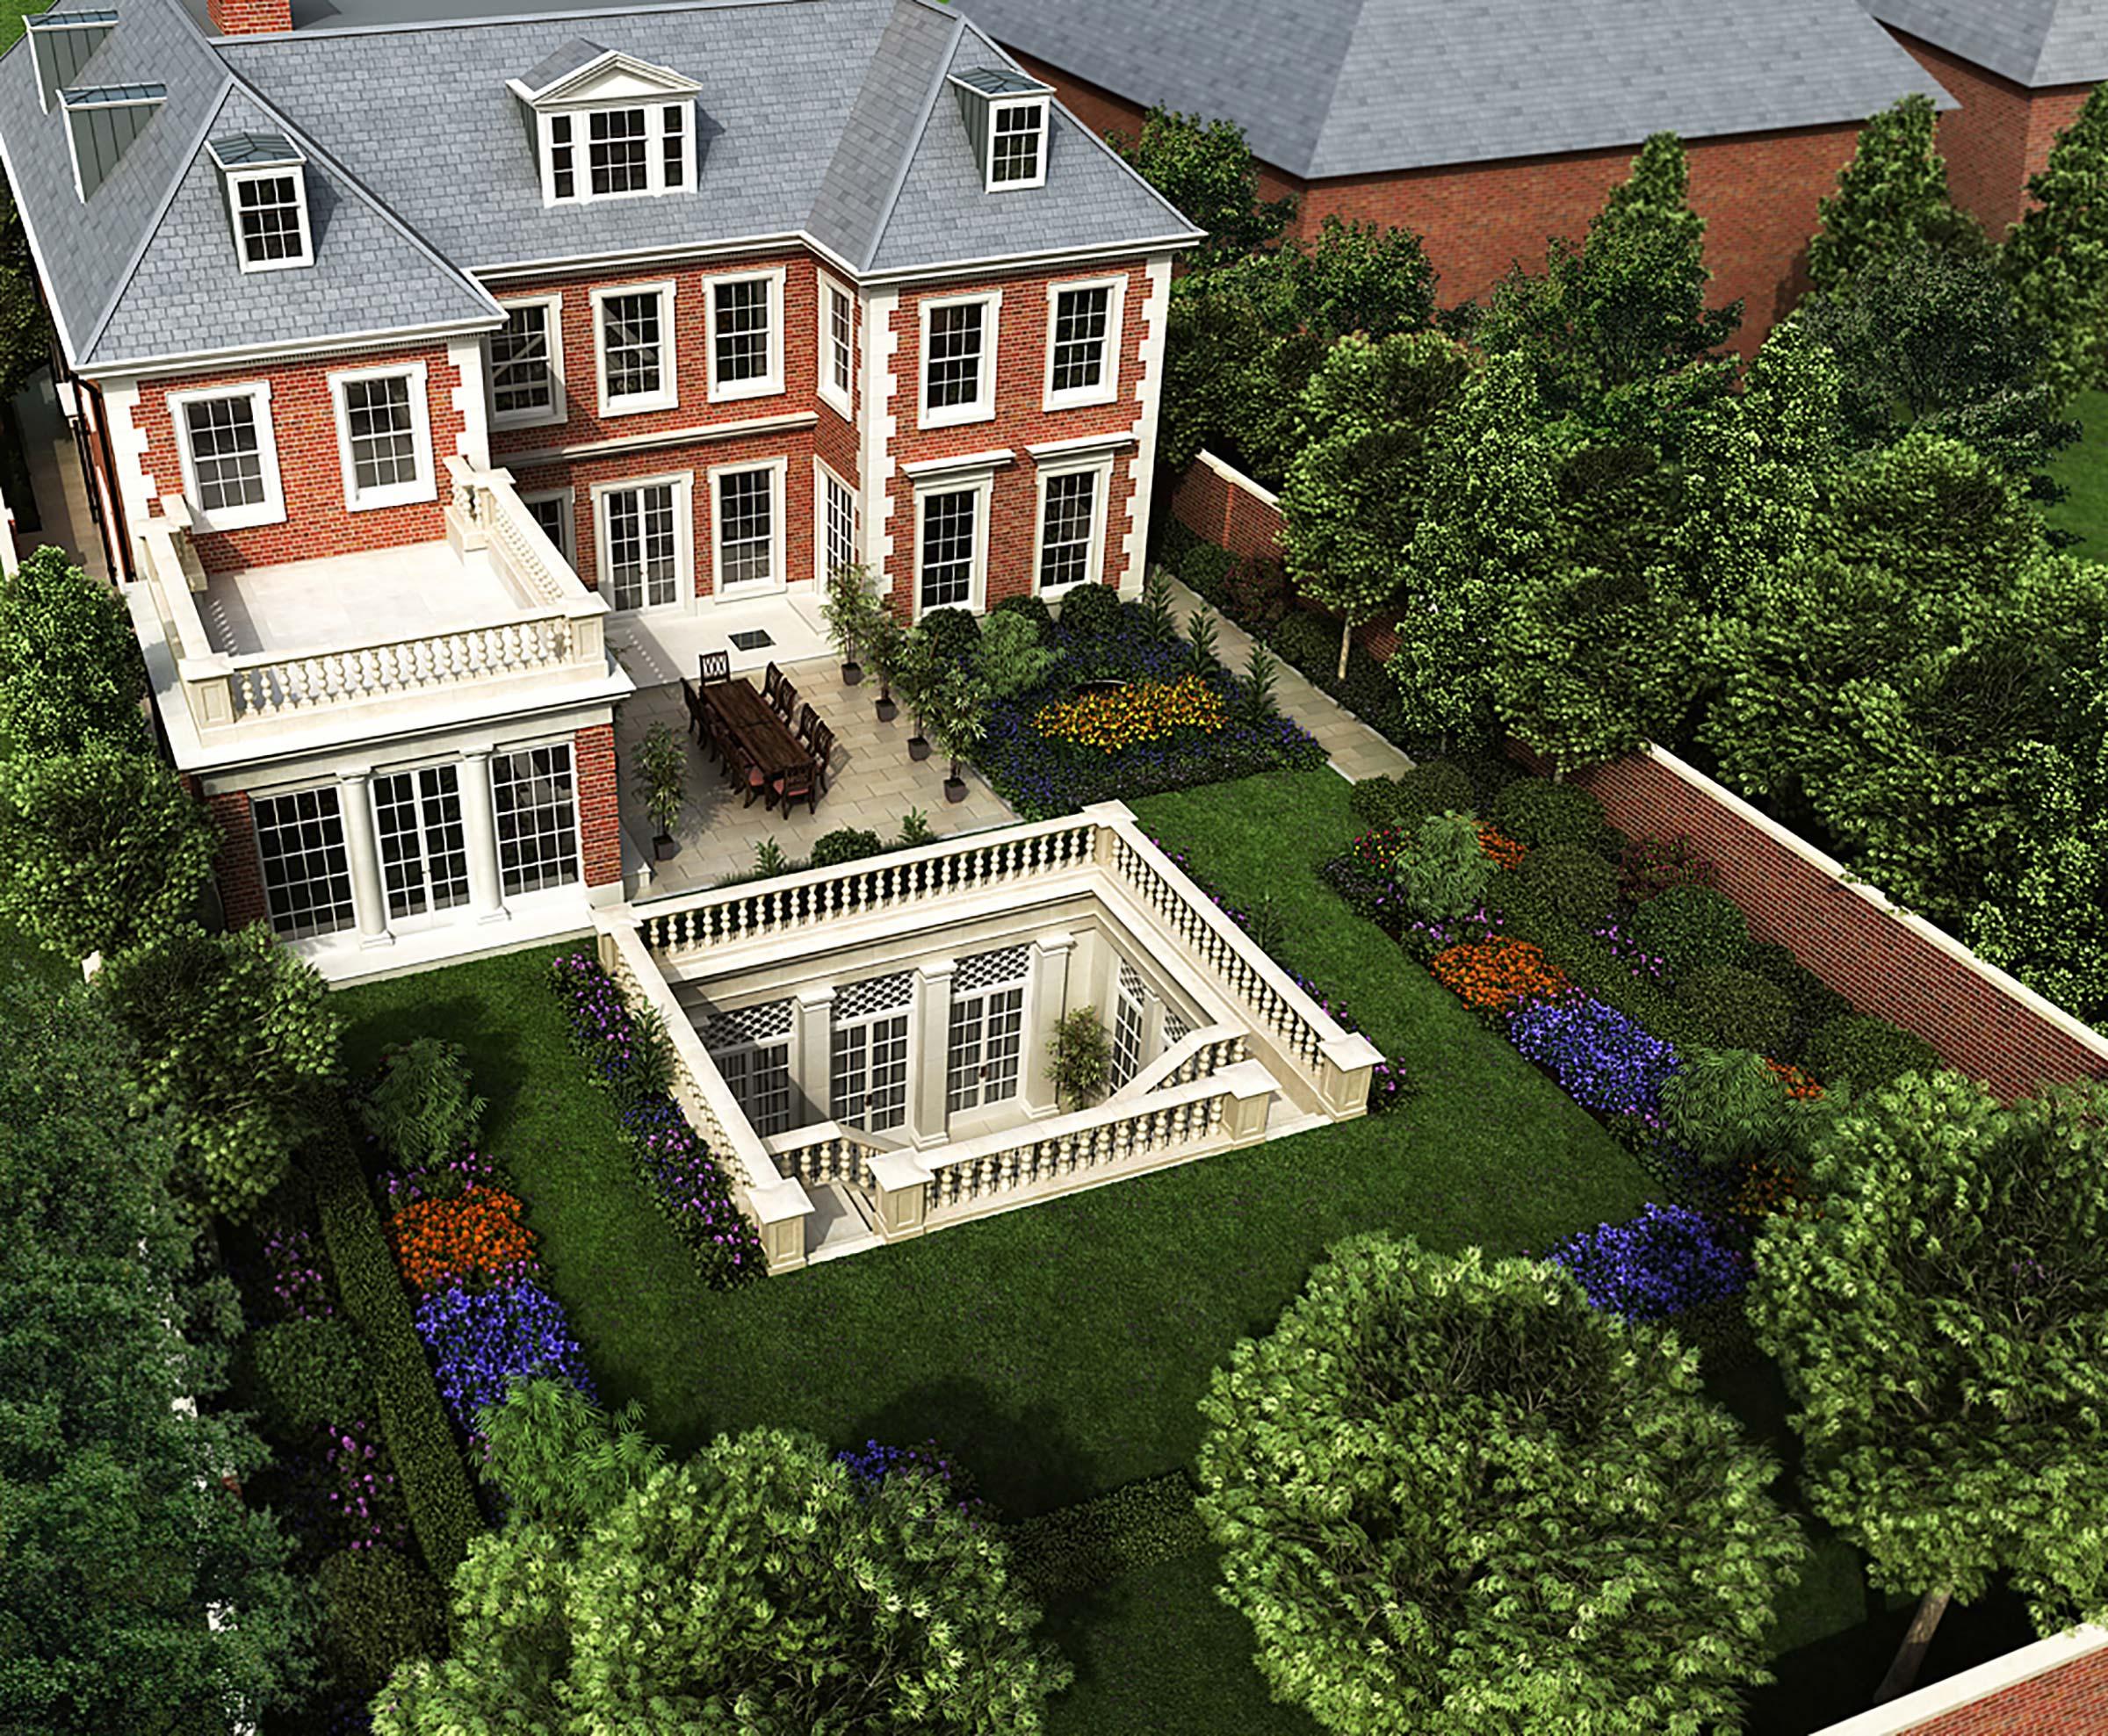 New house in St John's Wood, London